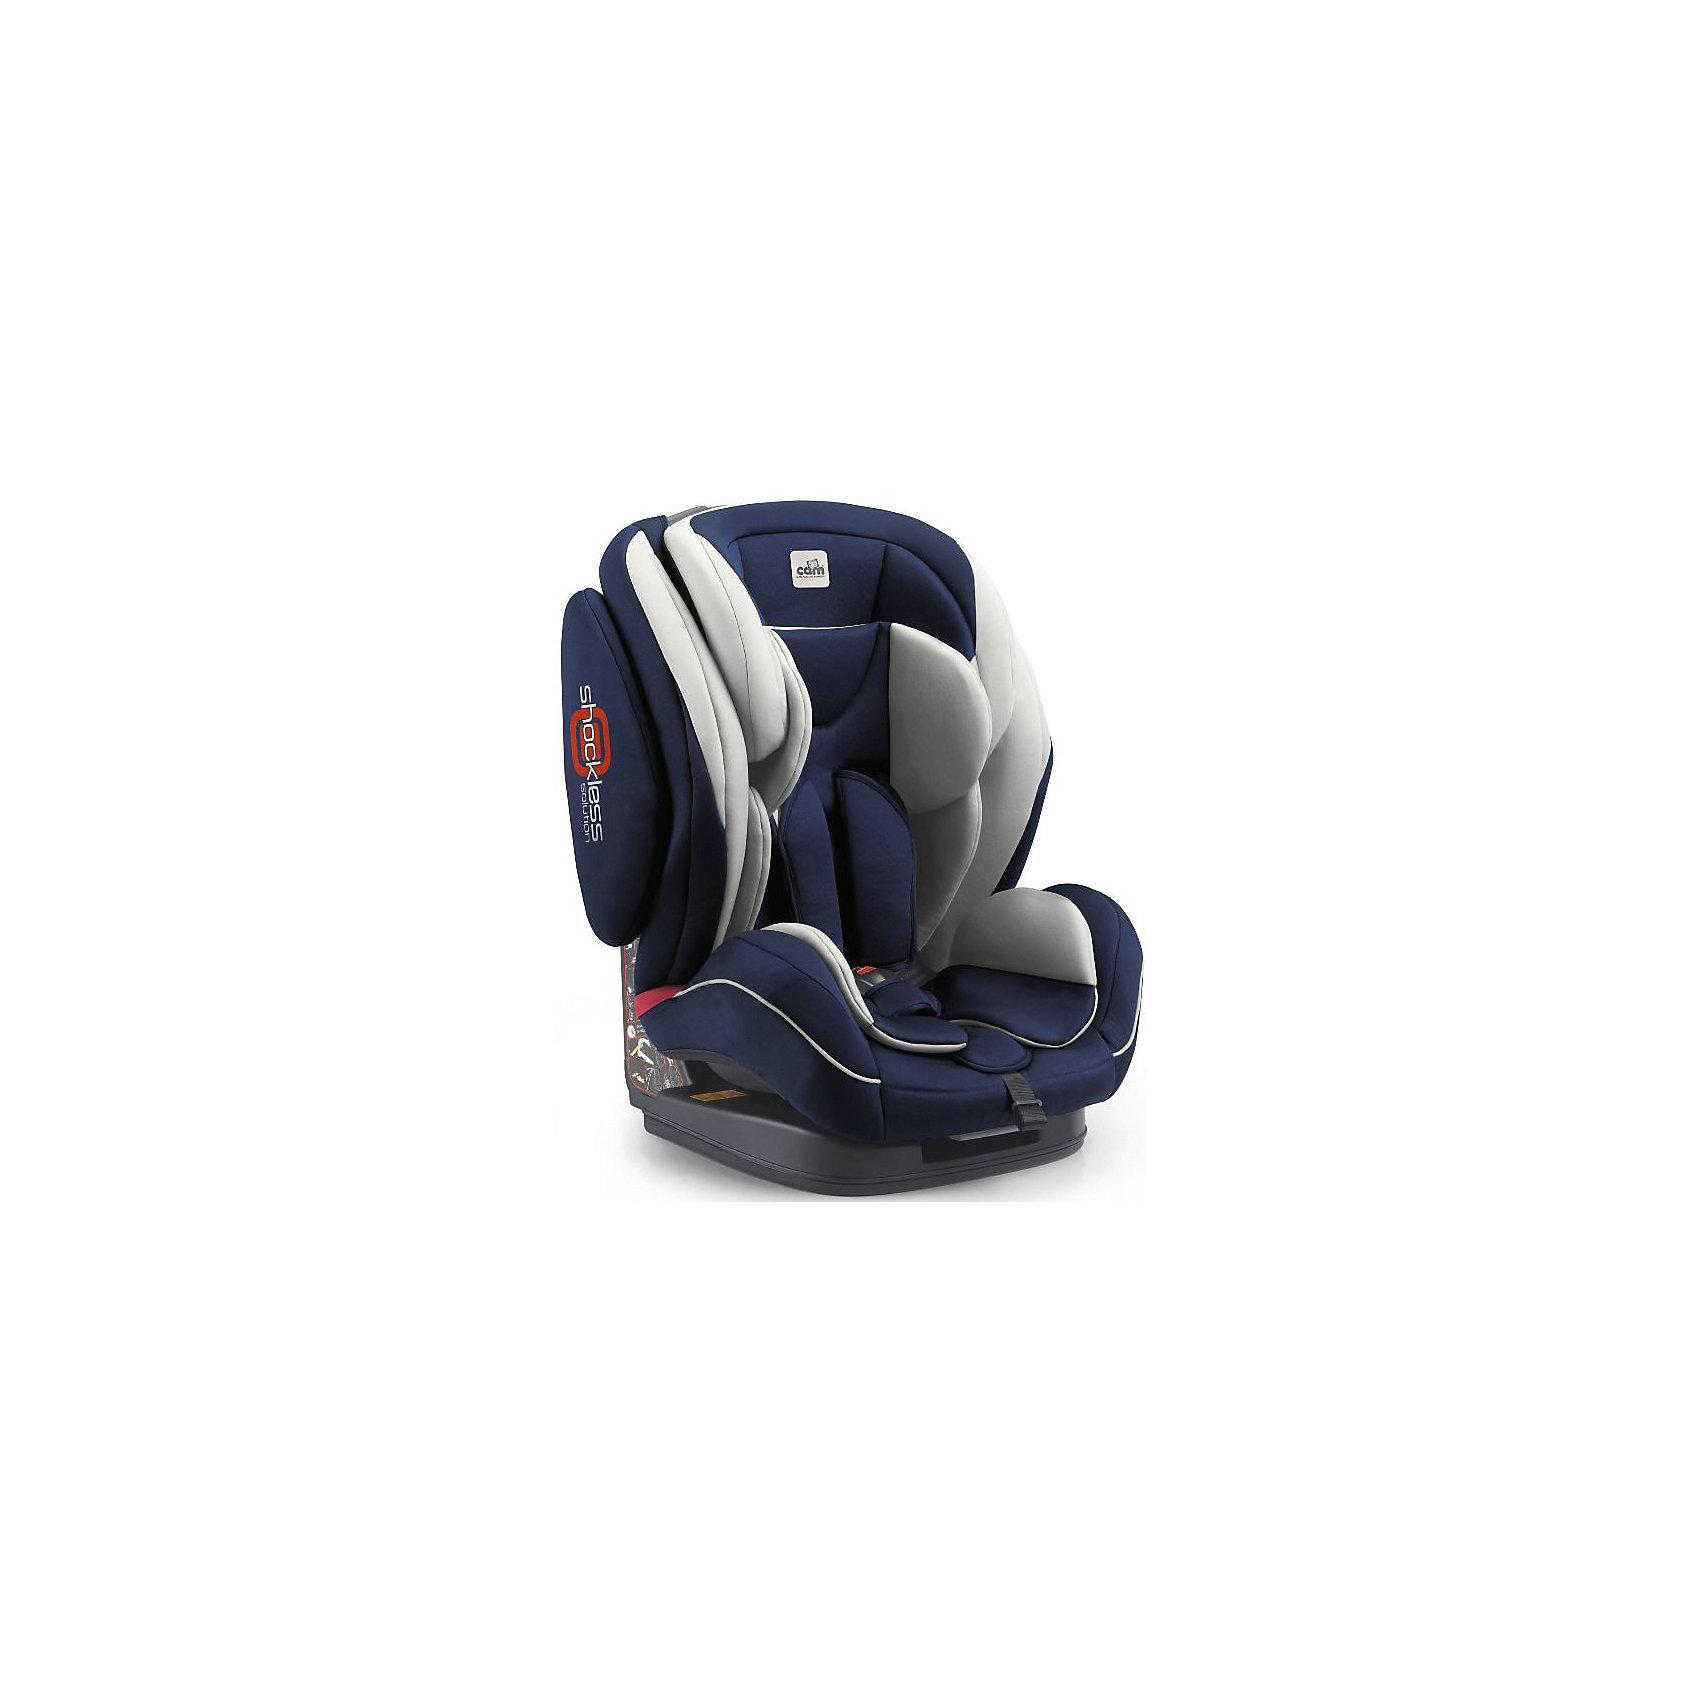 CAM Автокресло Regolo с Isofix, 9-36 кг., CAM, синий